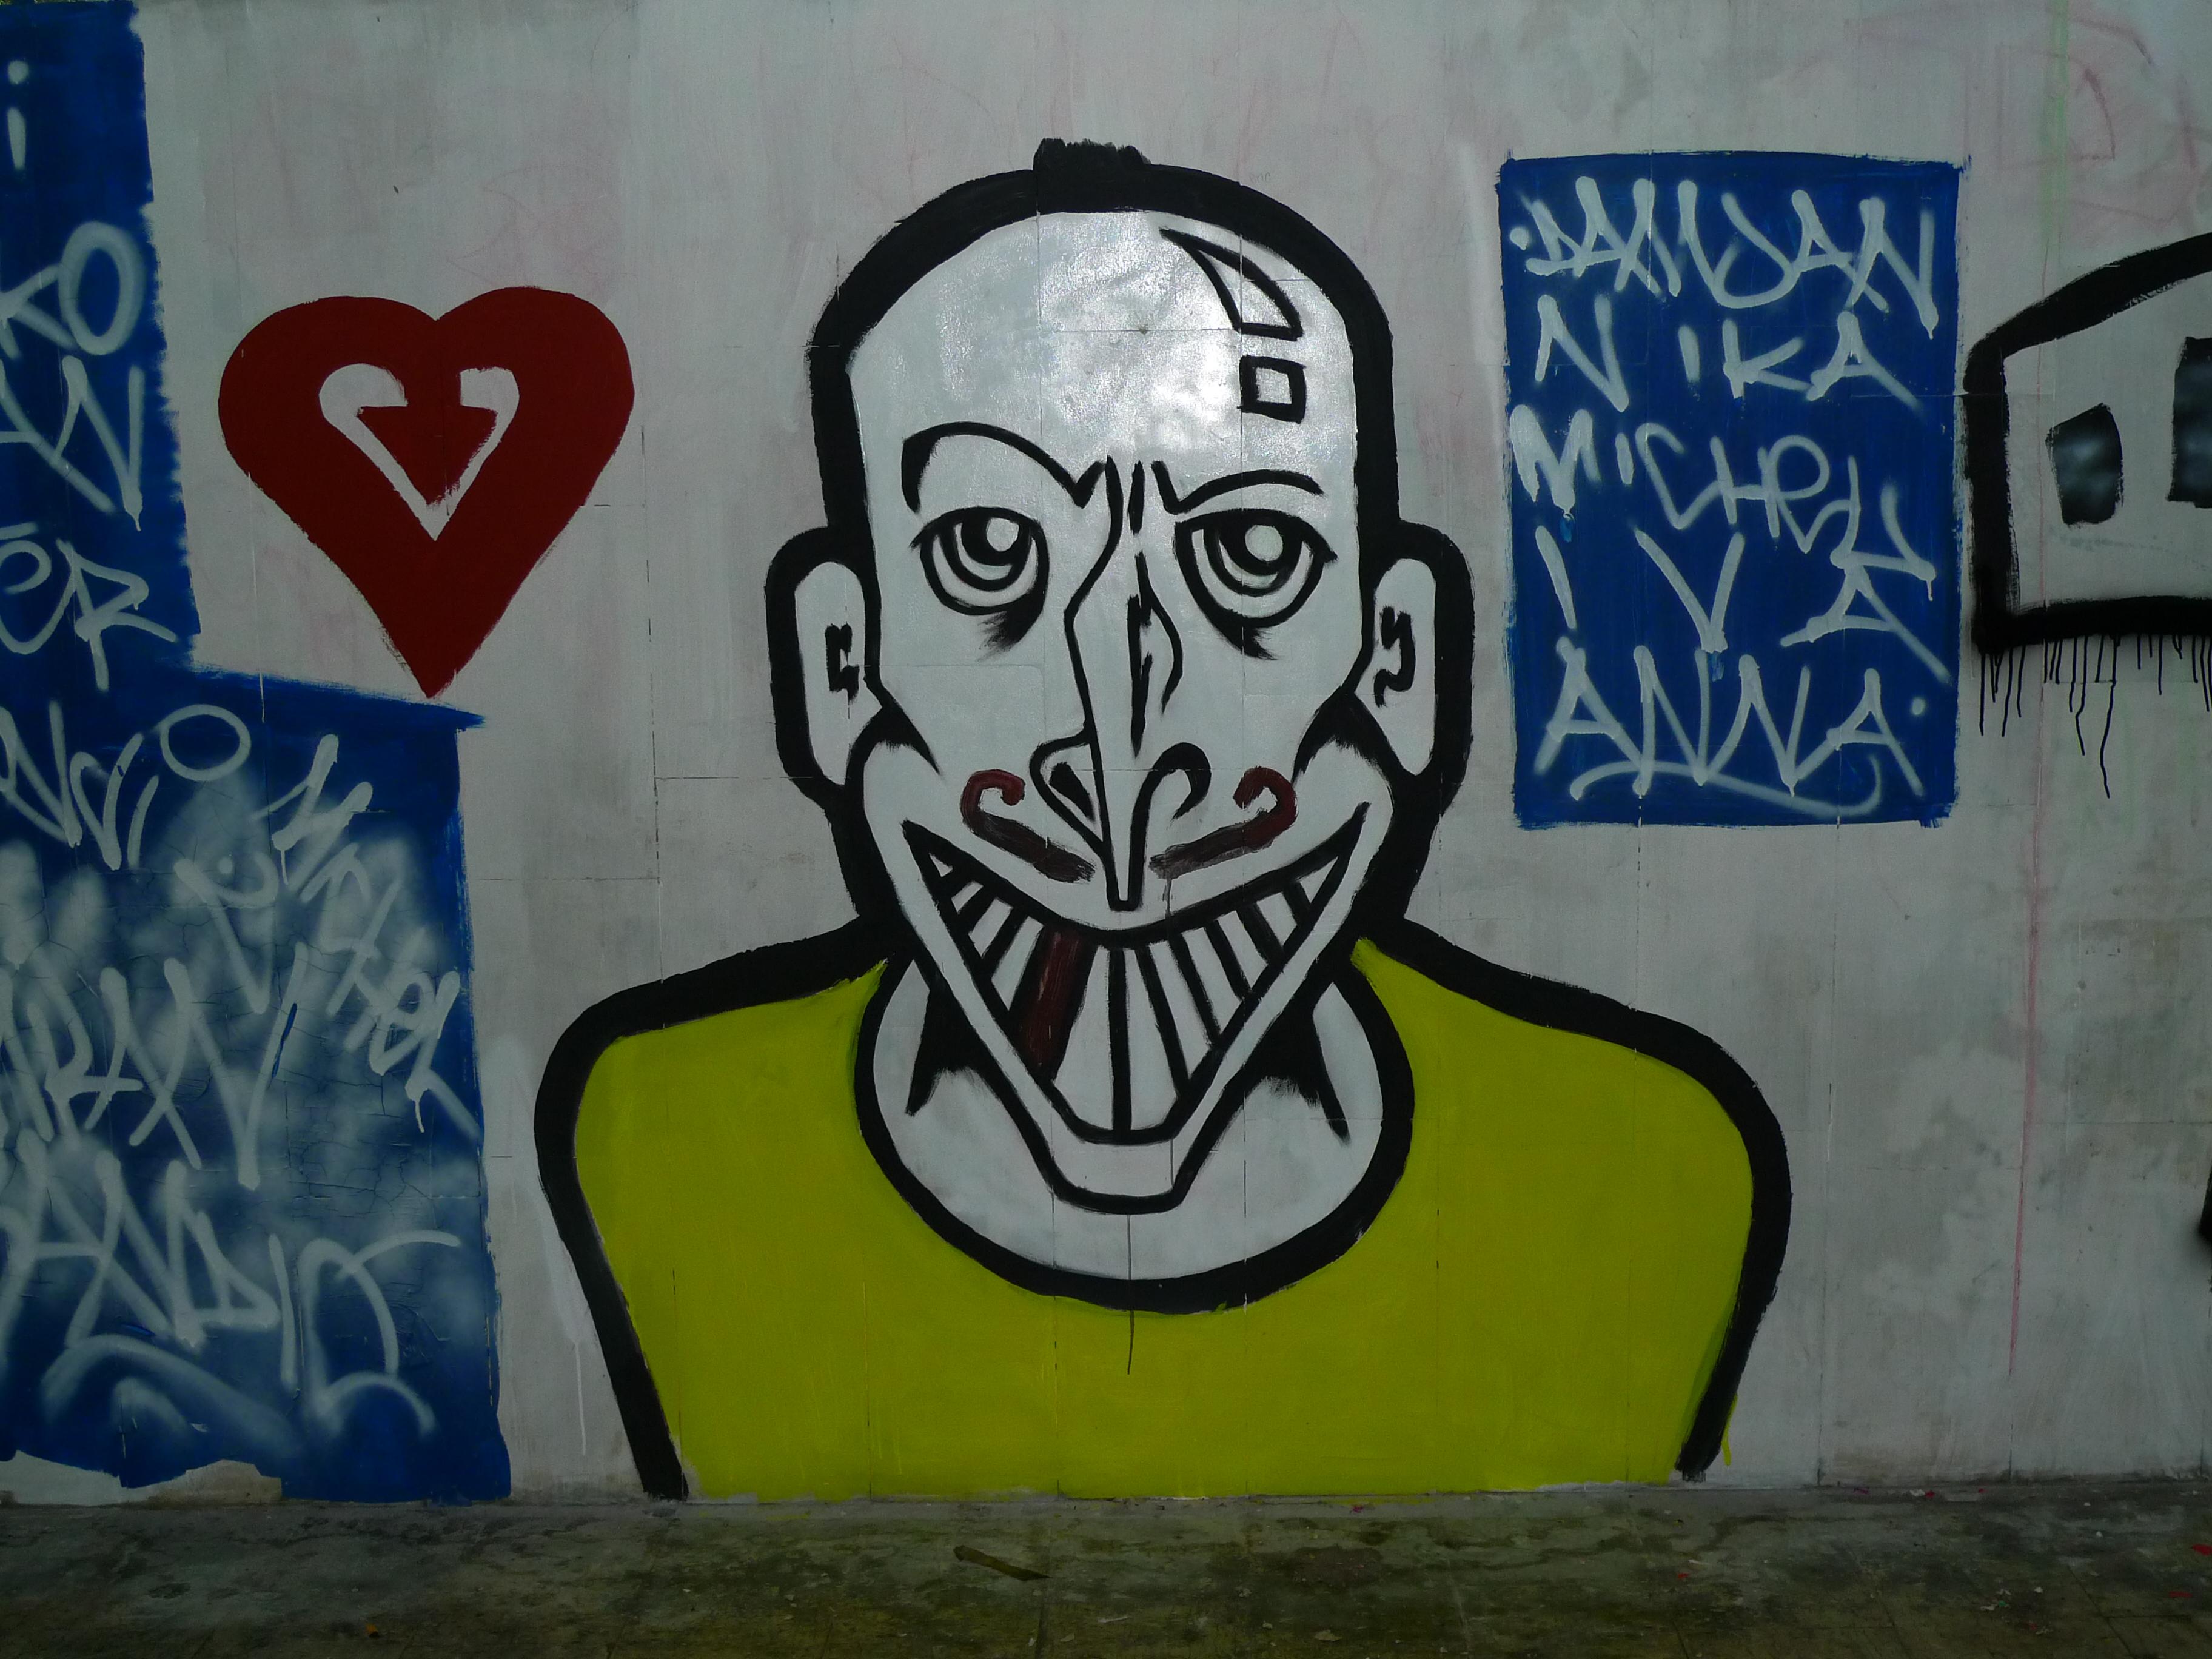 Smiley Faces Graffiti #616D00